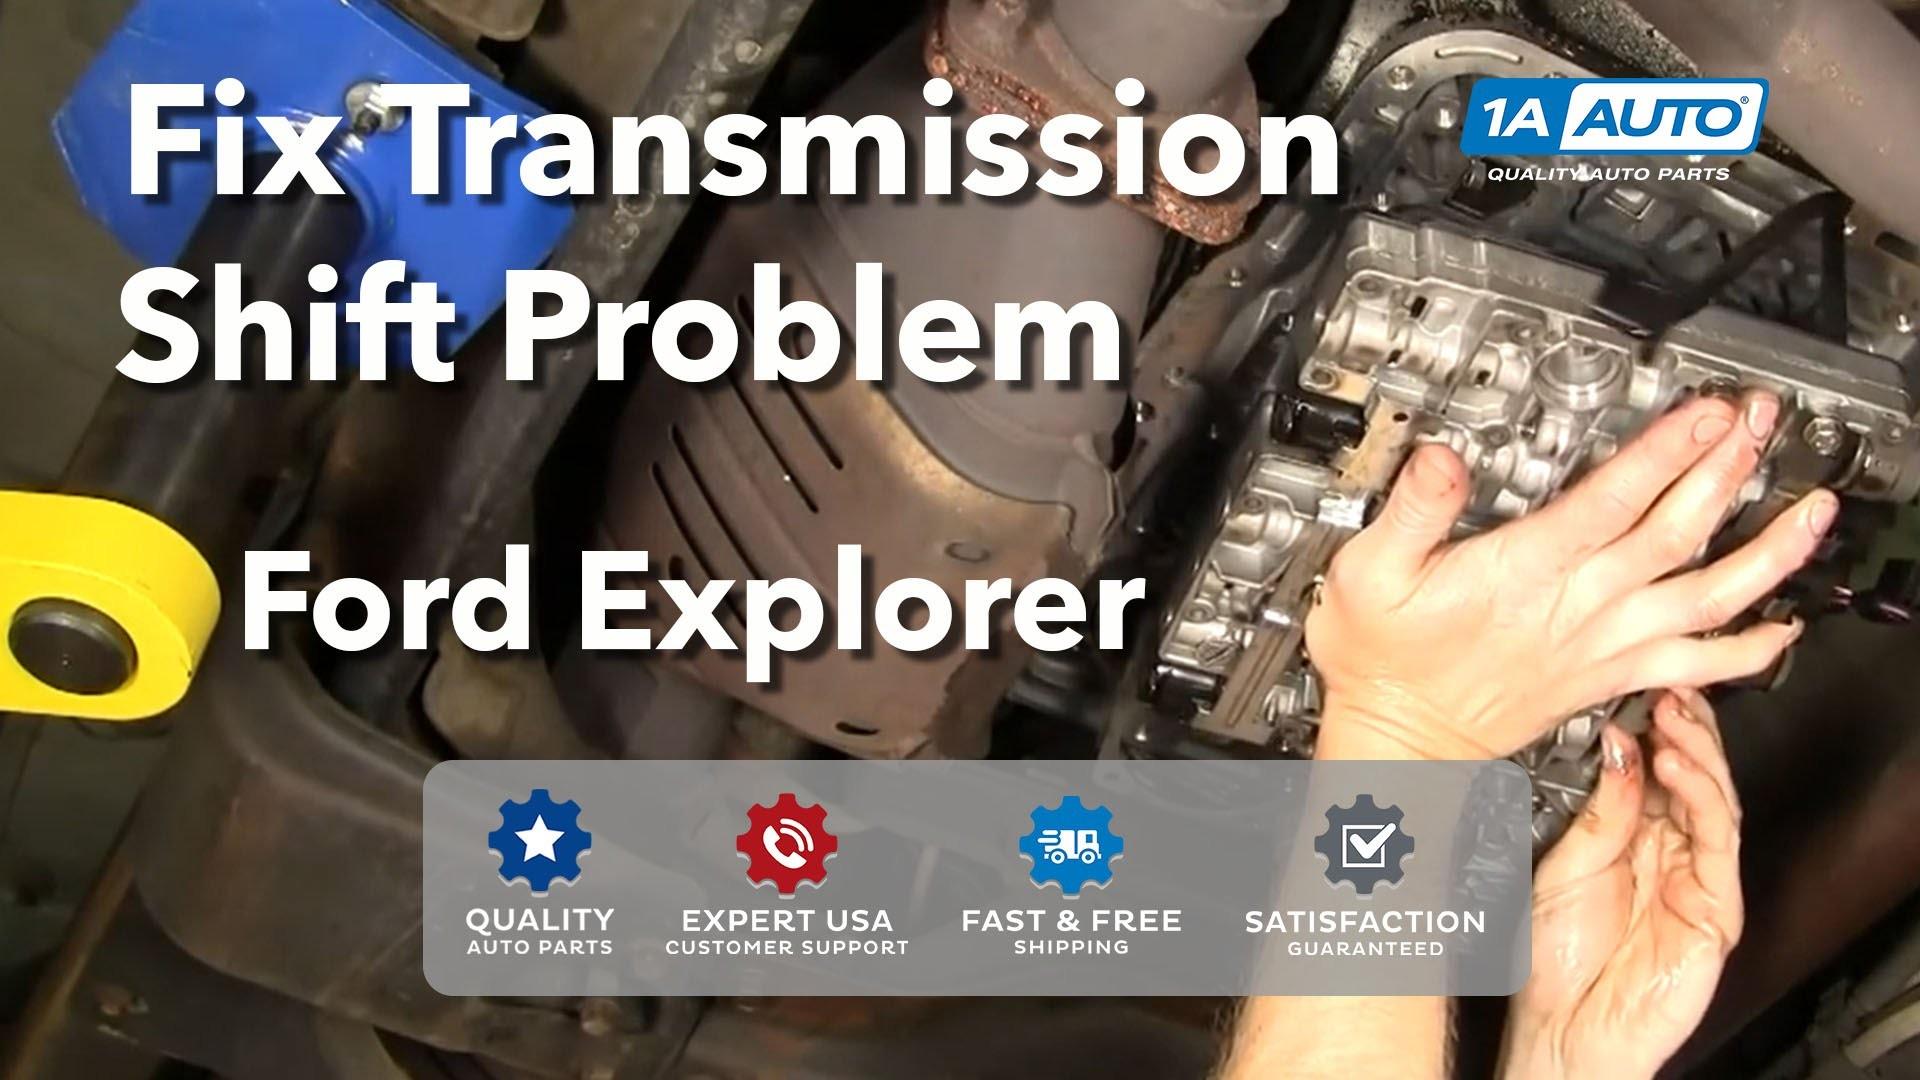 2003 ford Explorer Parts Diagram Auto Repair Fix Transmission Shift Problem ford 5r55e Explorer Buy Of 2003 ford Explorer Parts Diagram